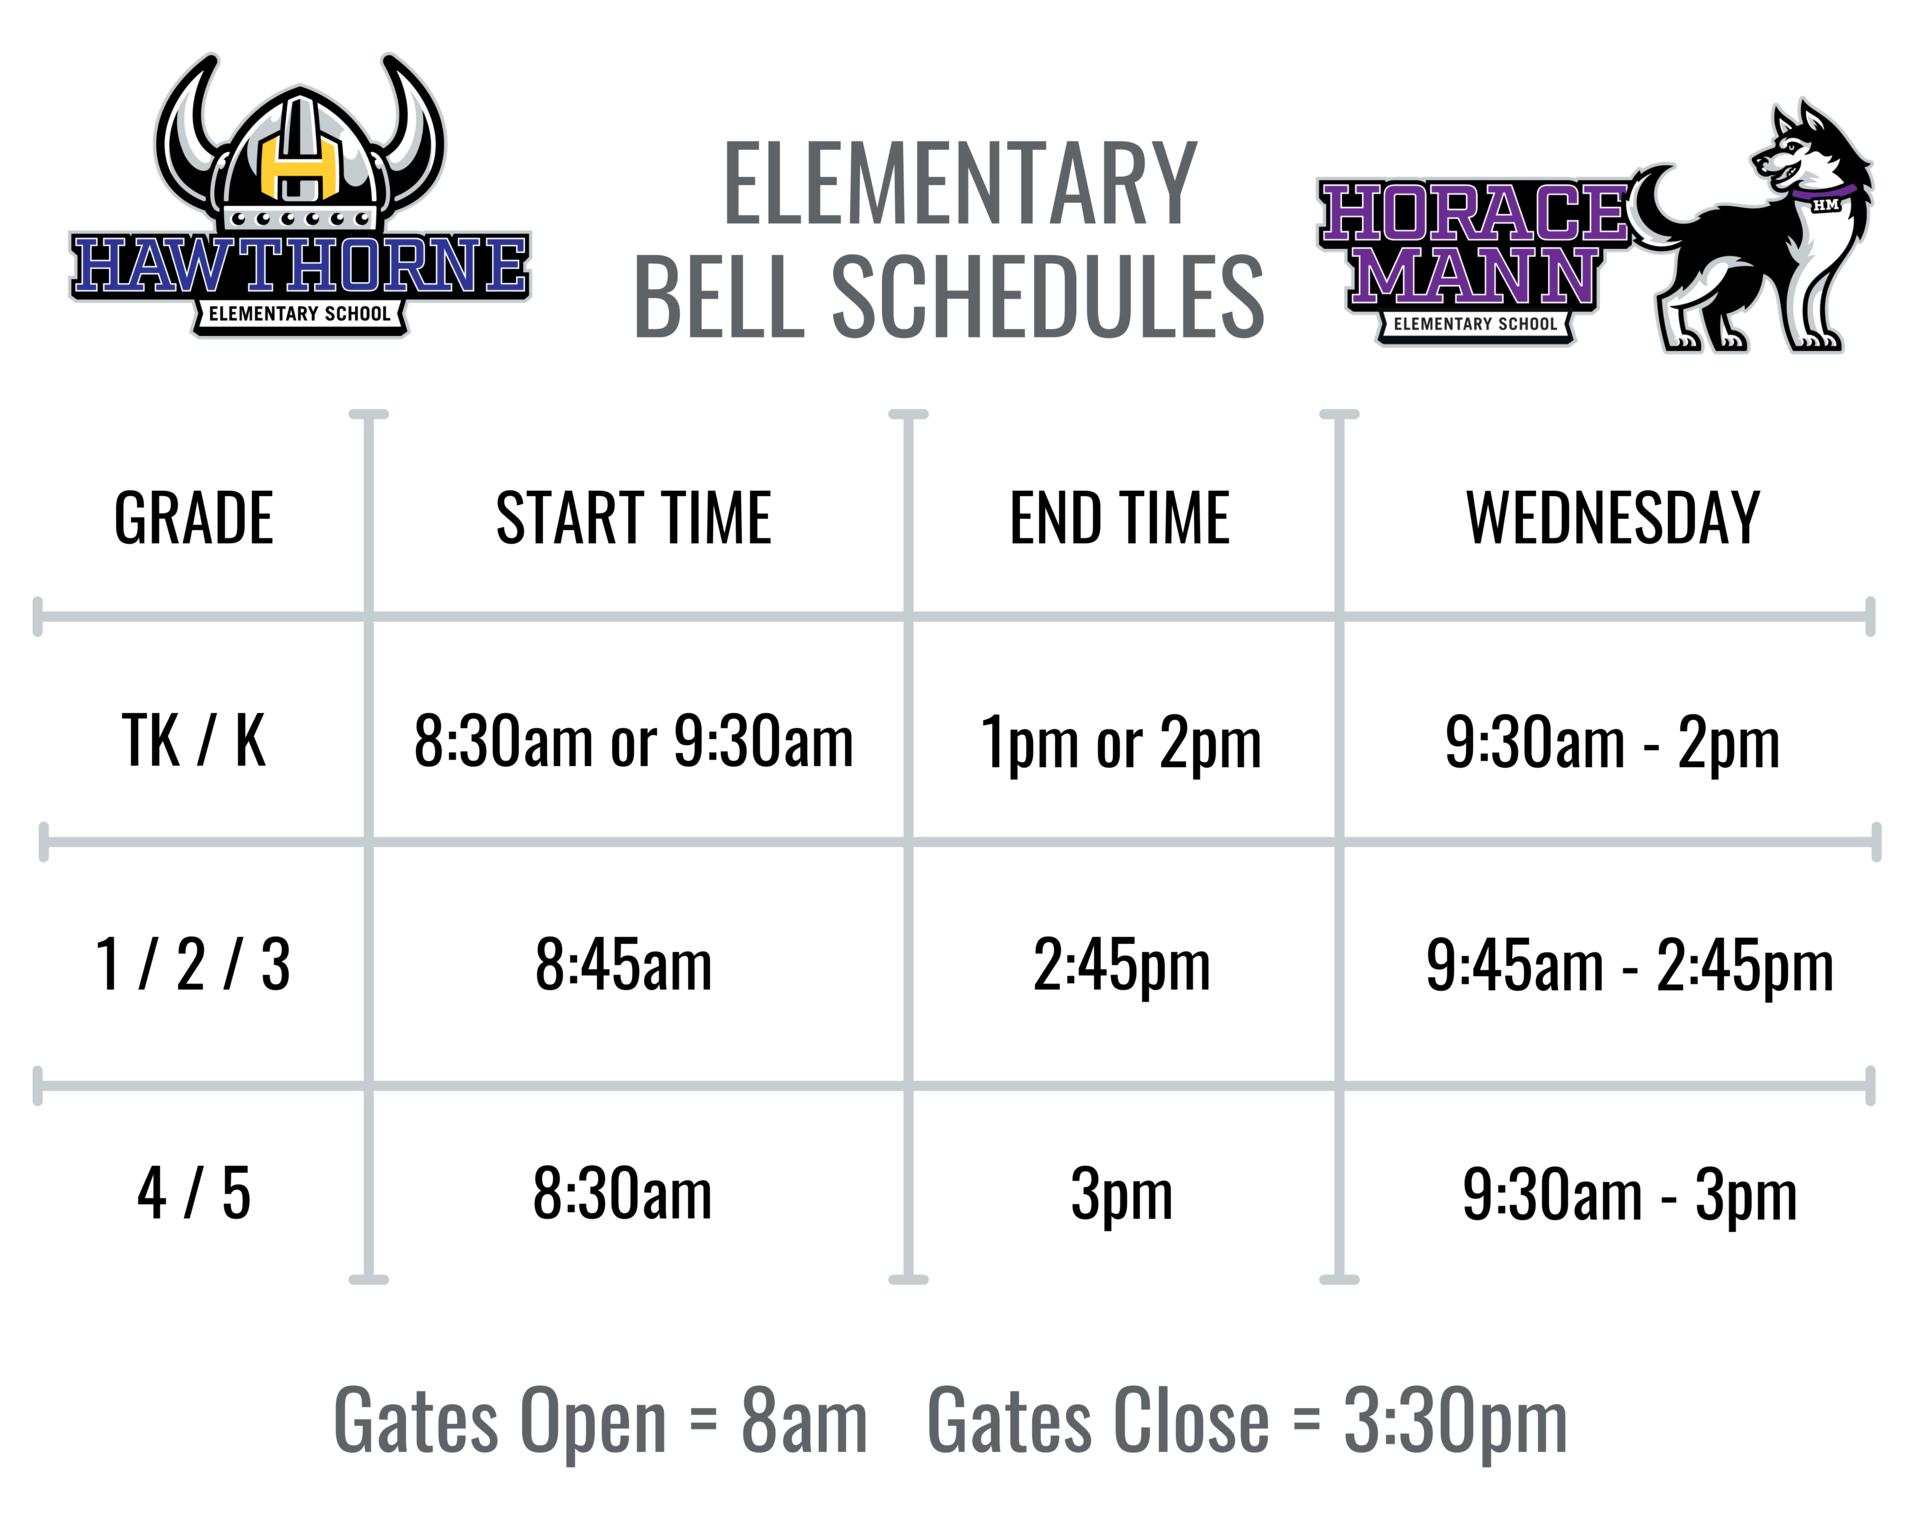 Elementary Bell Schedules